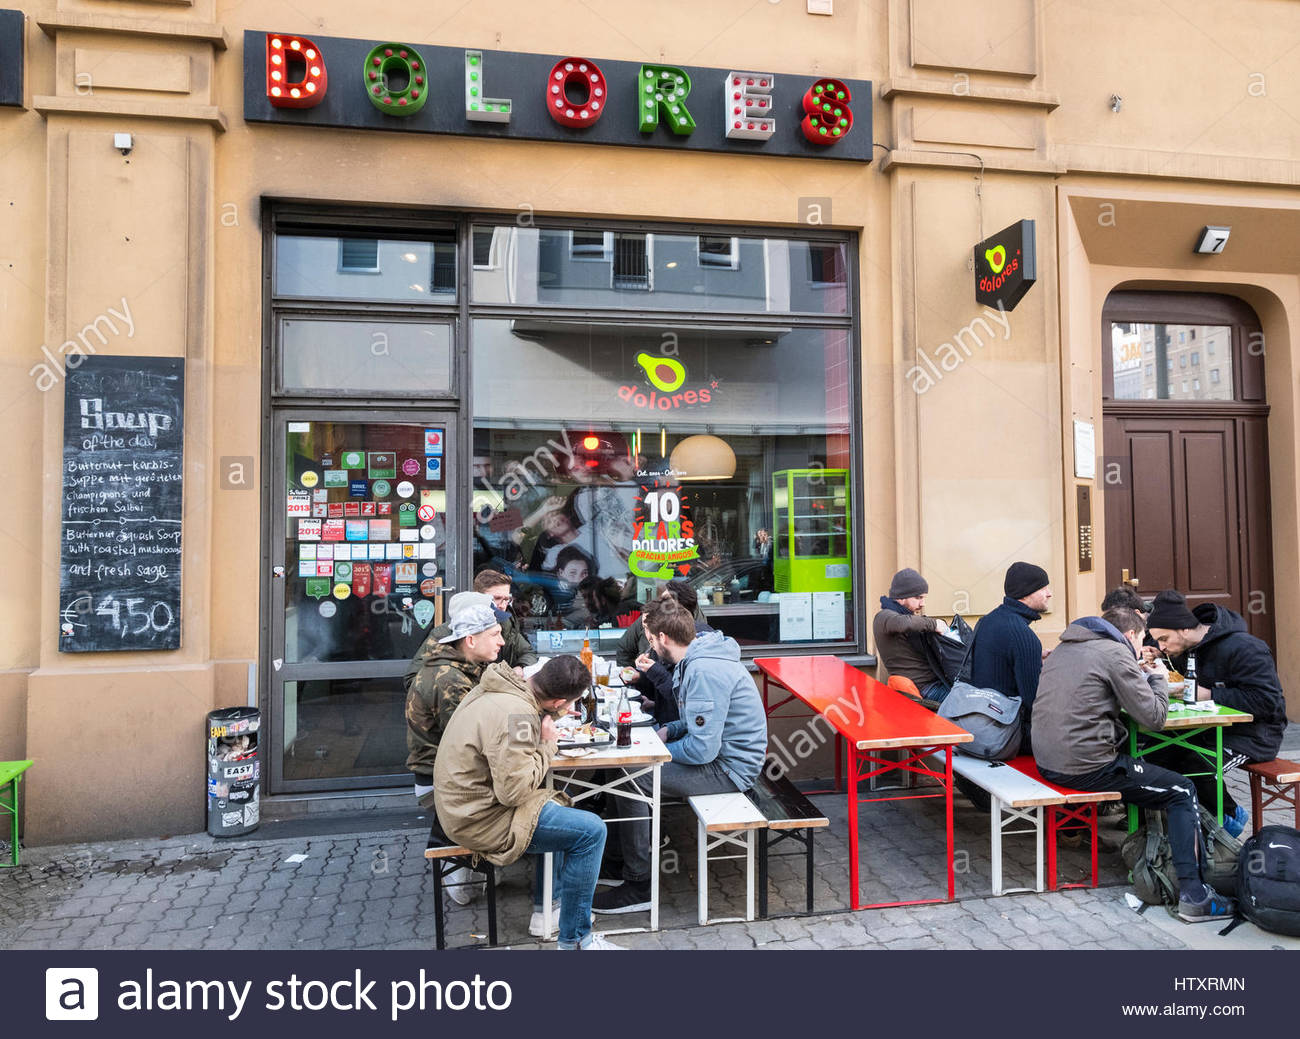 Englischer Garten Berlin Neu Dolores Burrito Fast Food Restaurant In Mitte Berlin